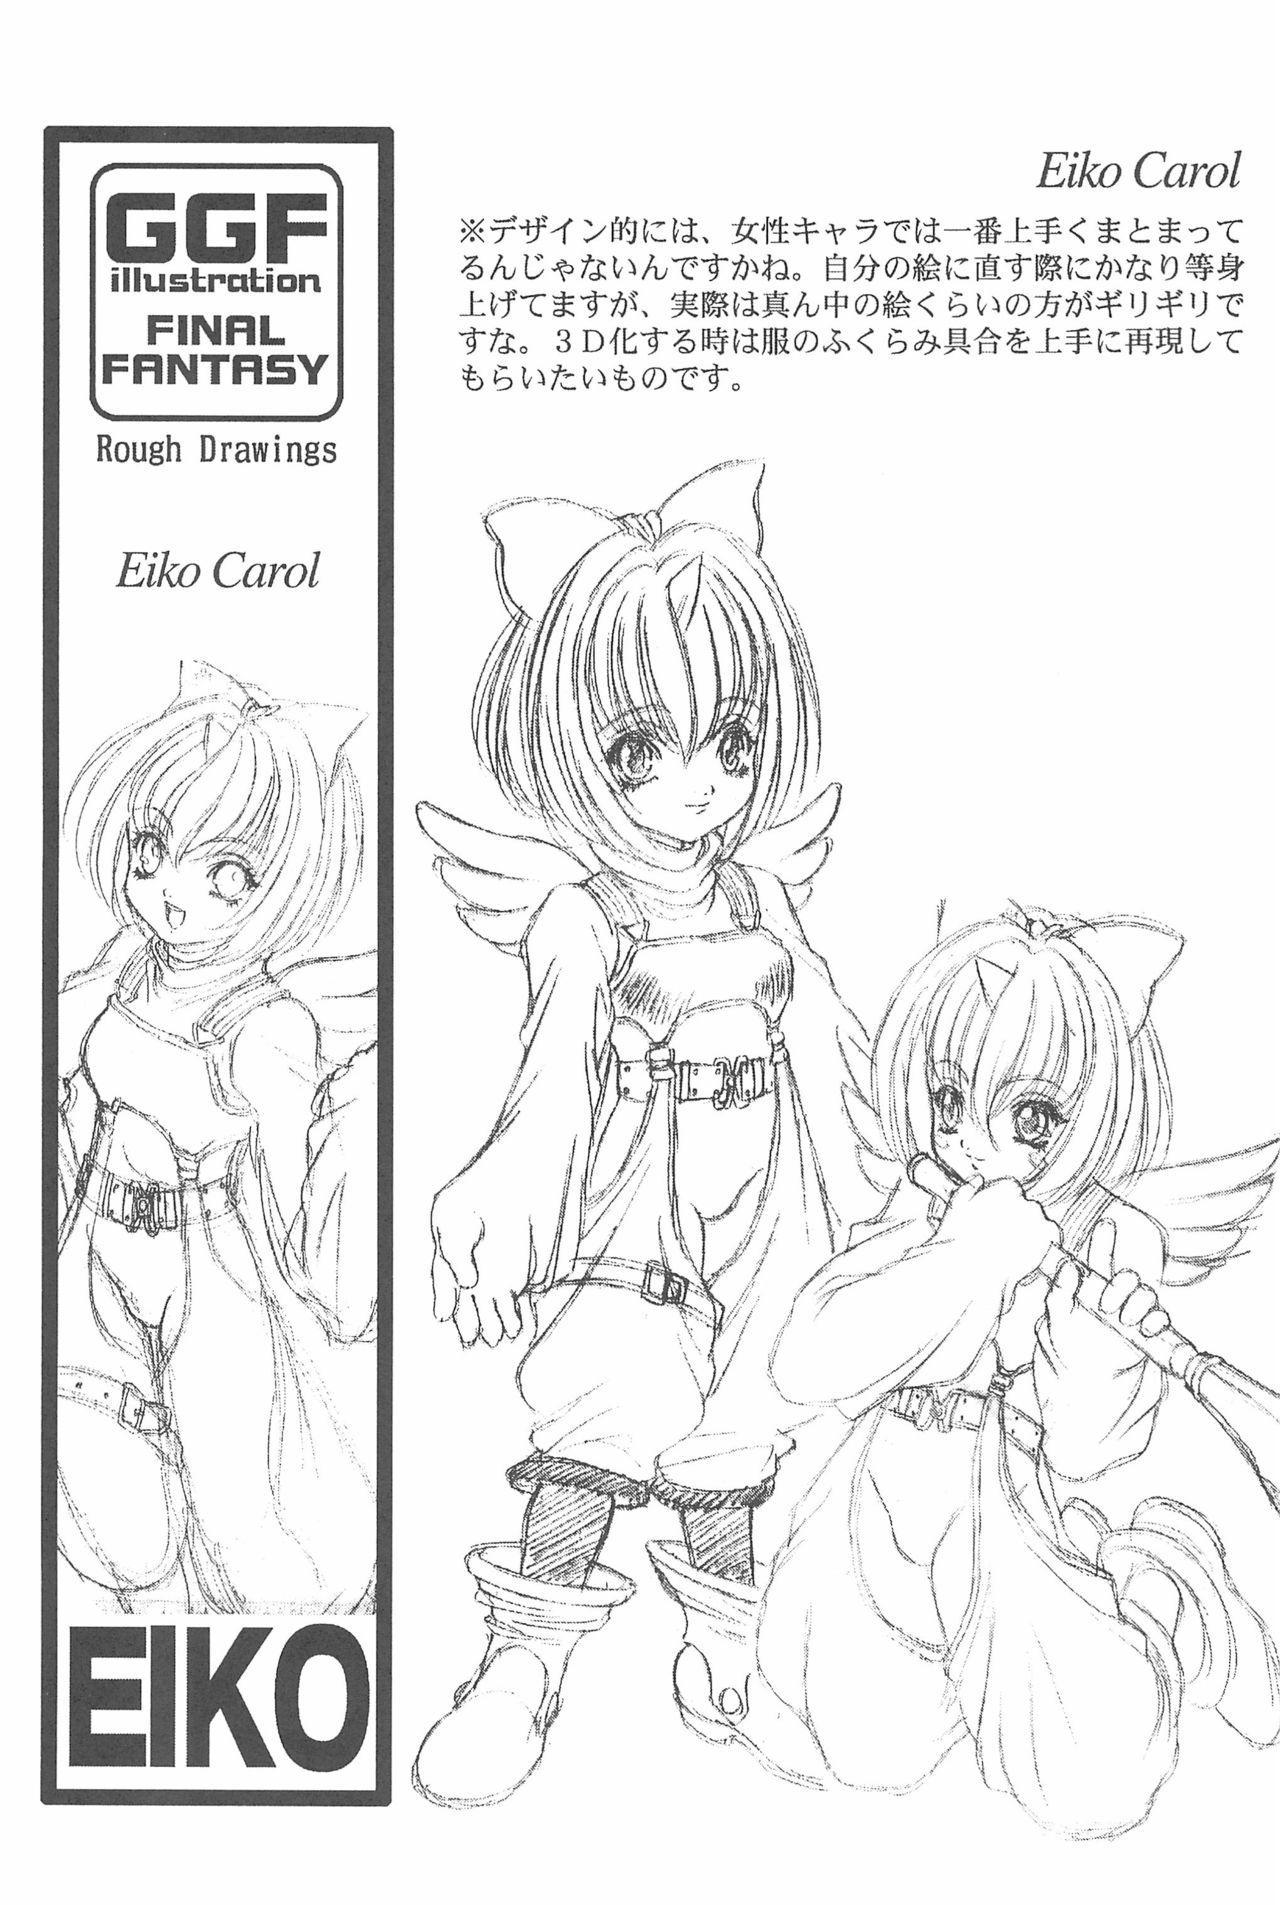 Game Giga Fantasy 3 28